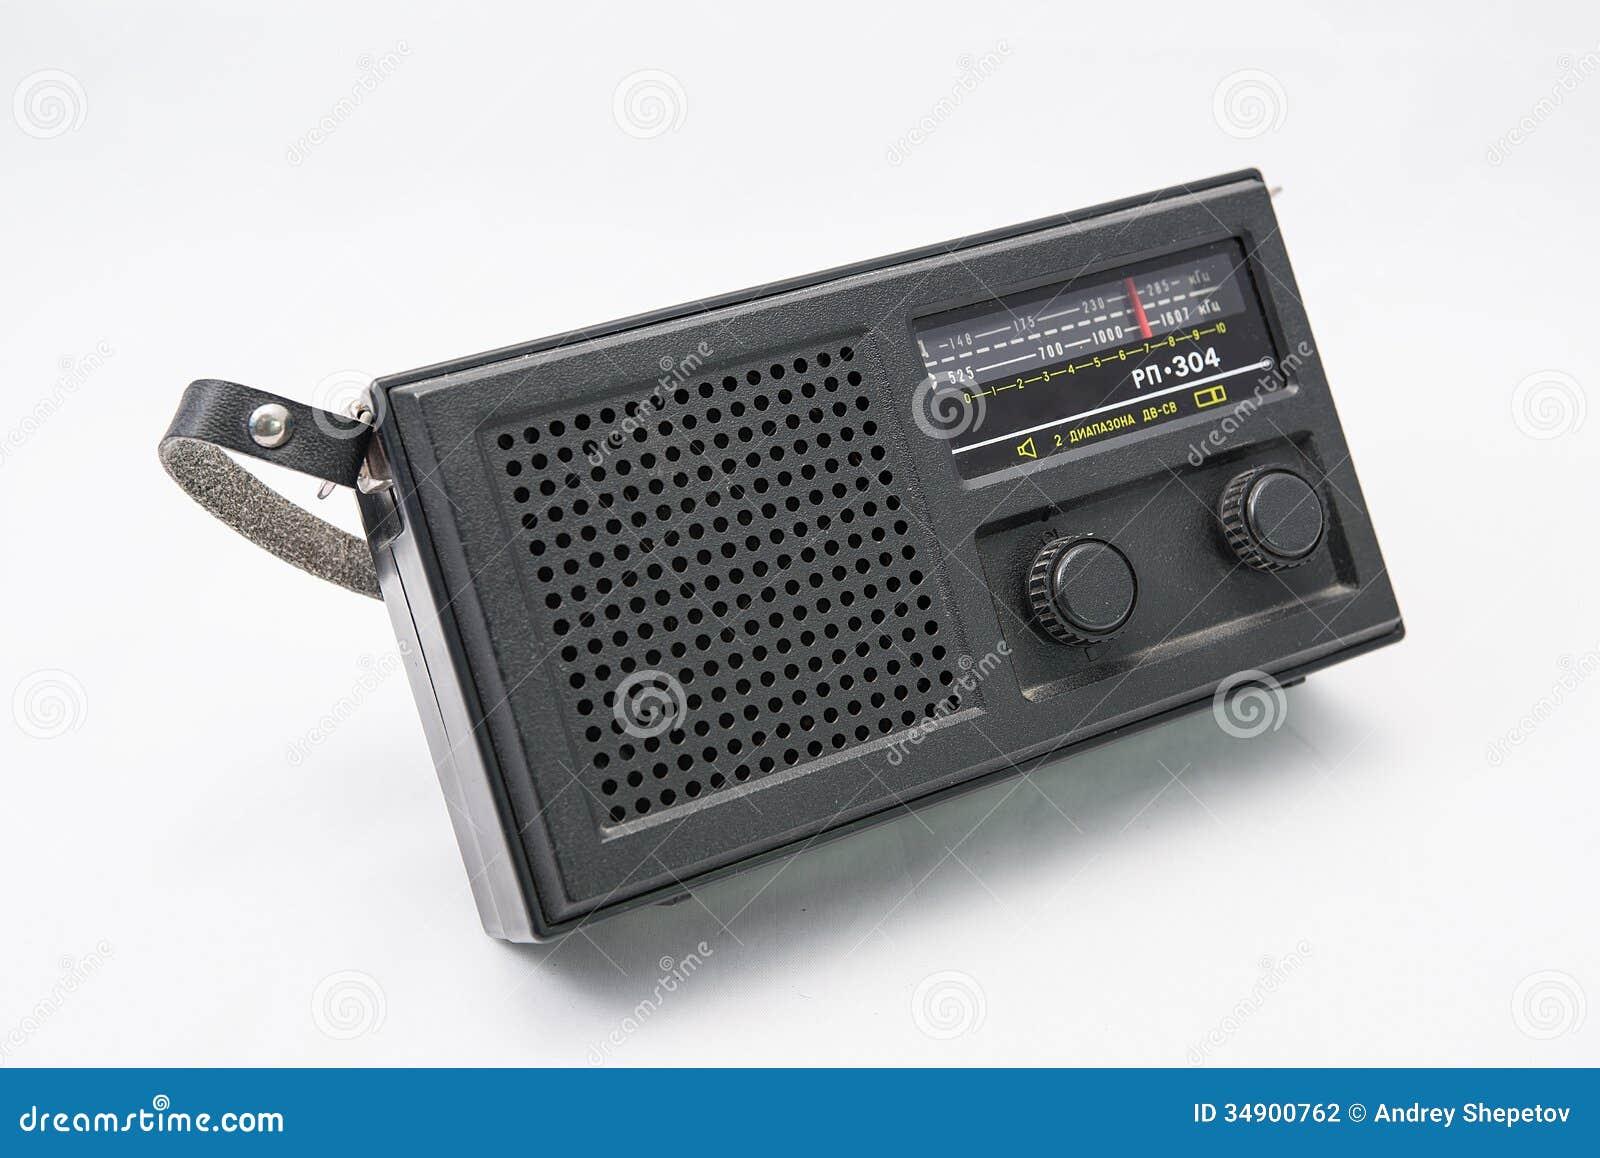 Transistor radio stock photo  Image of scale, union